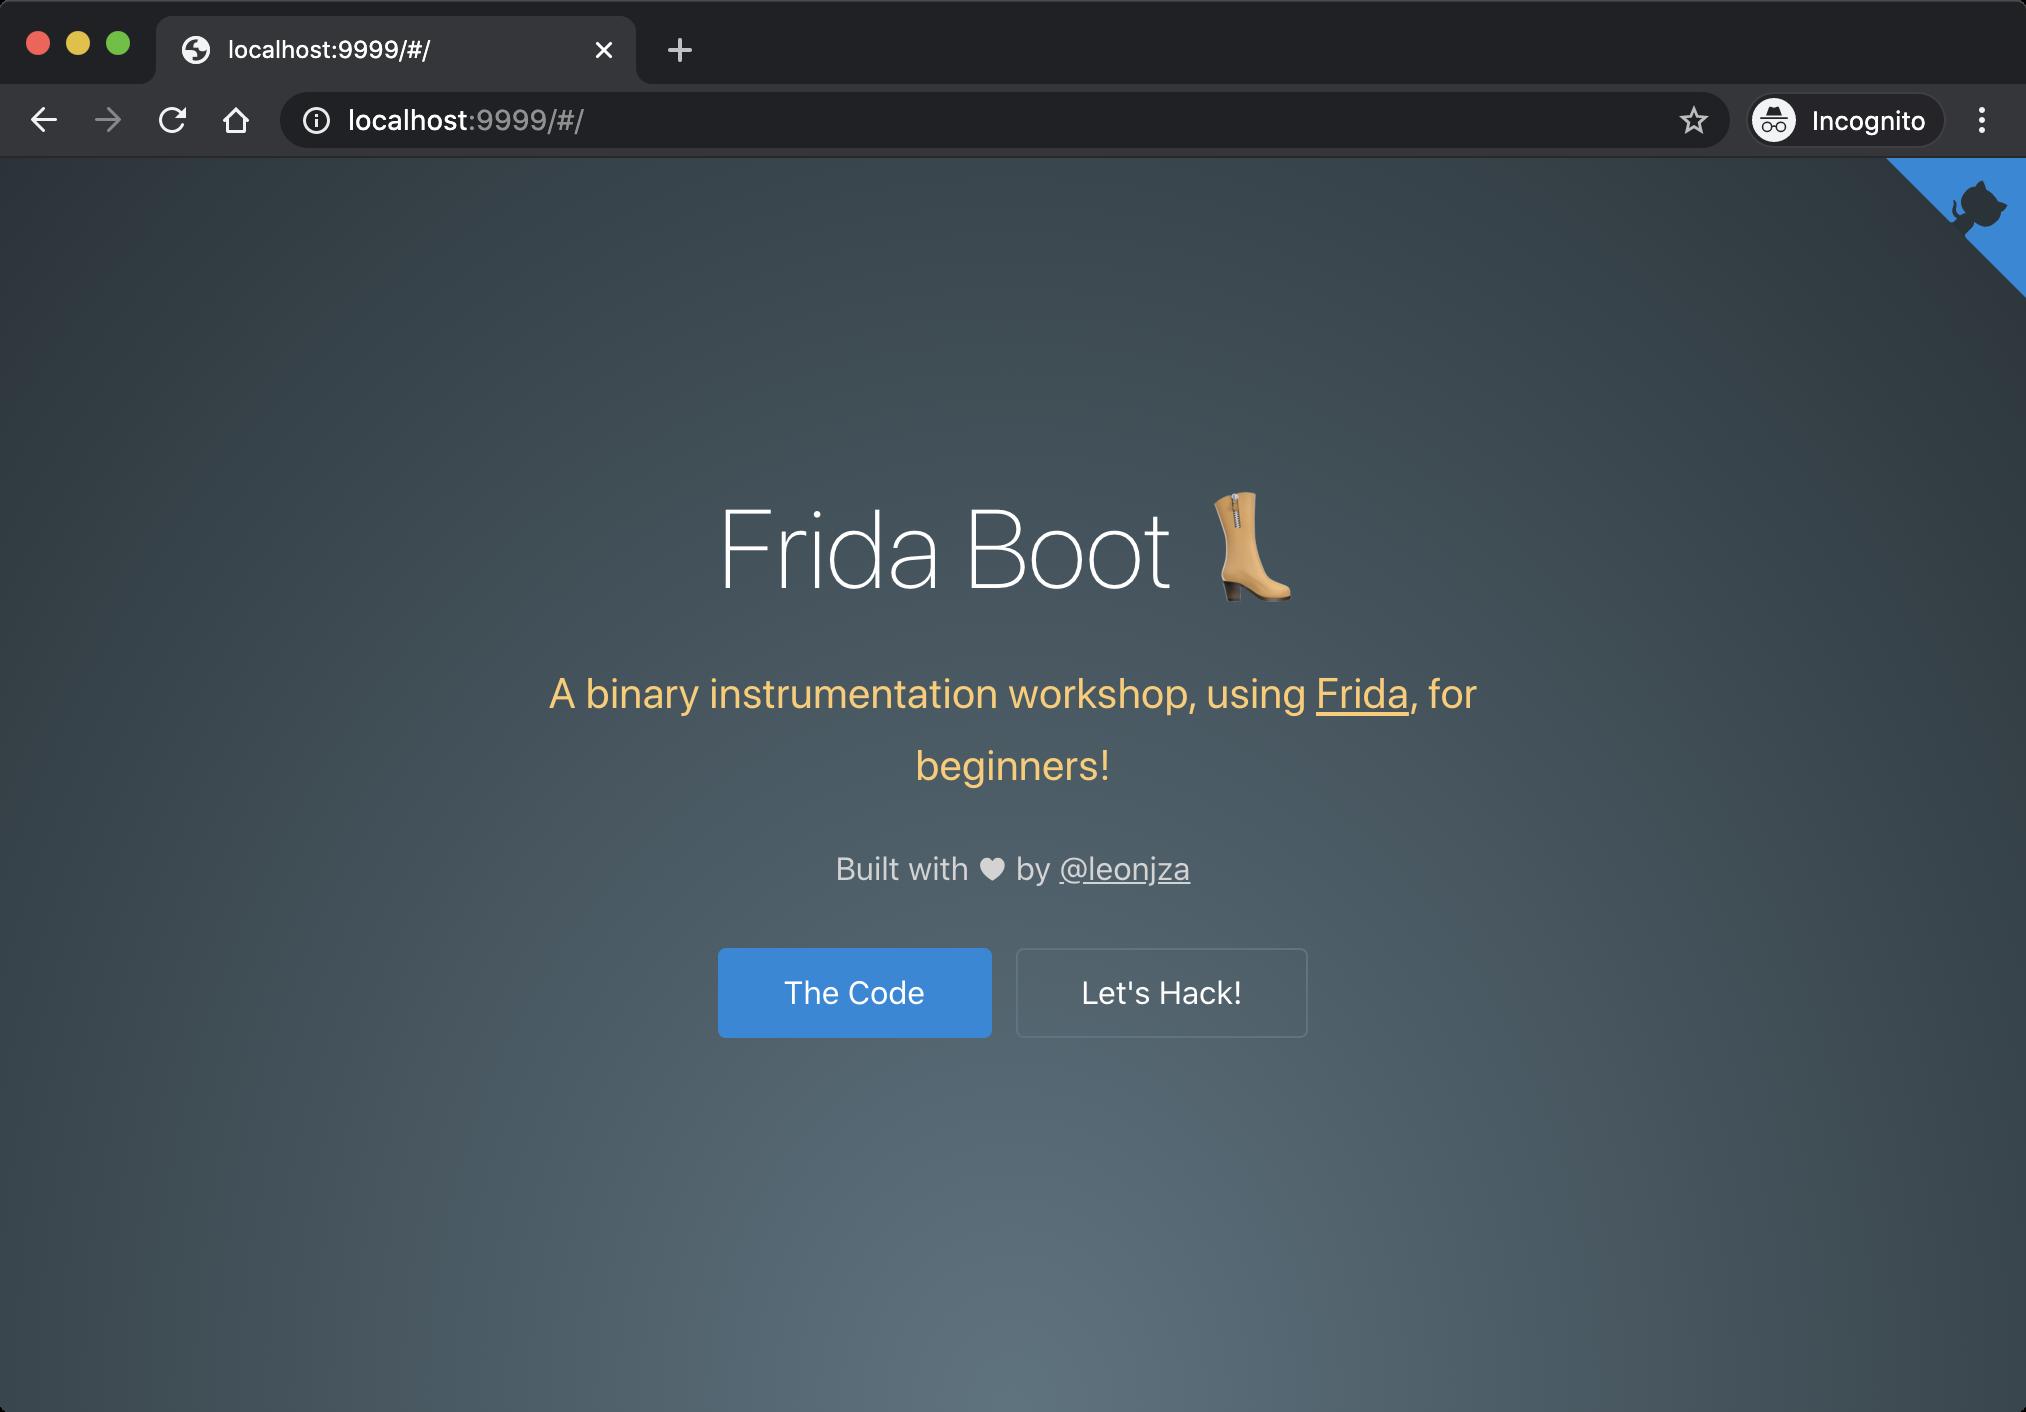 frida-boot